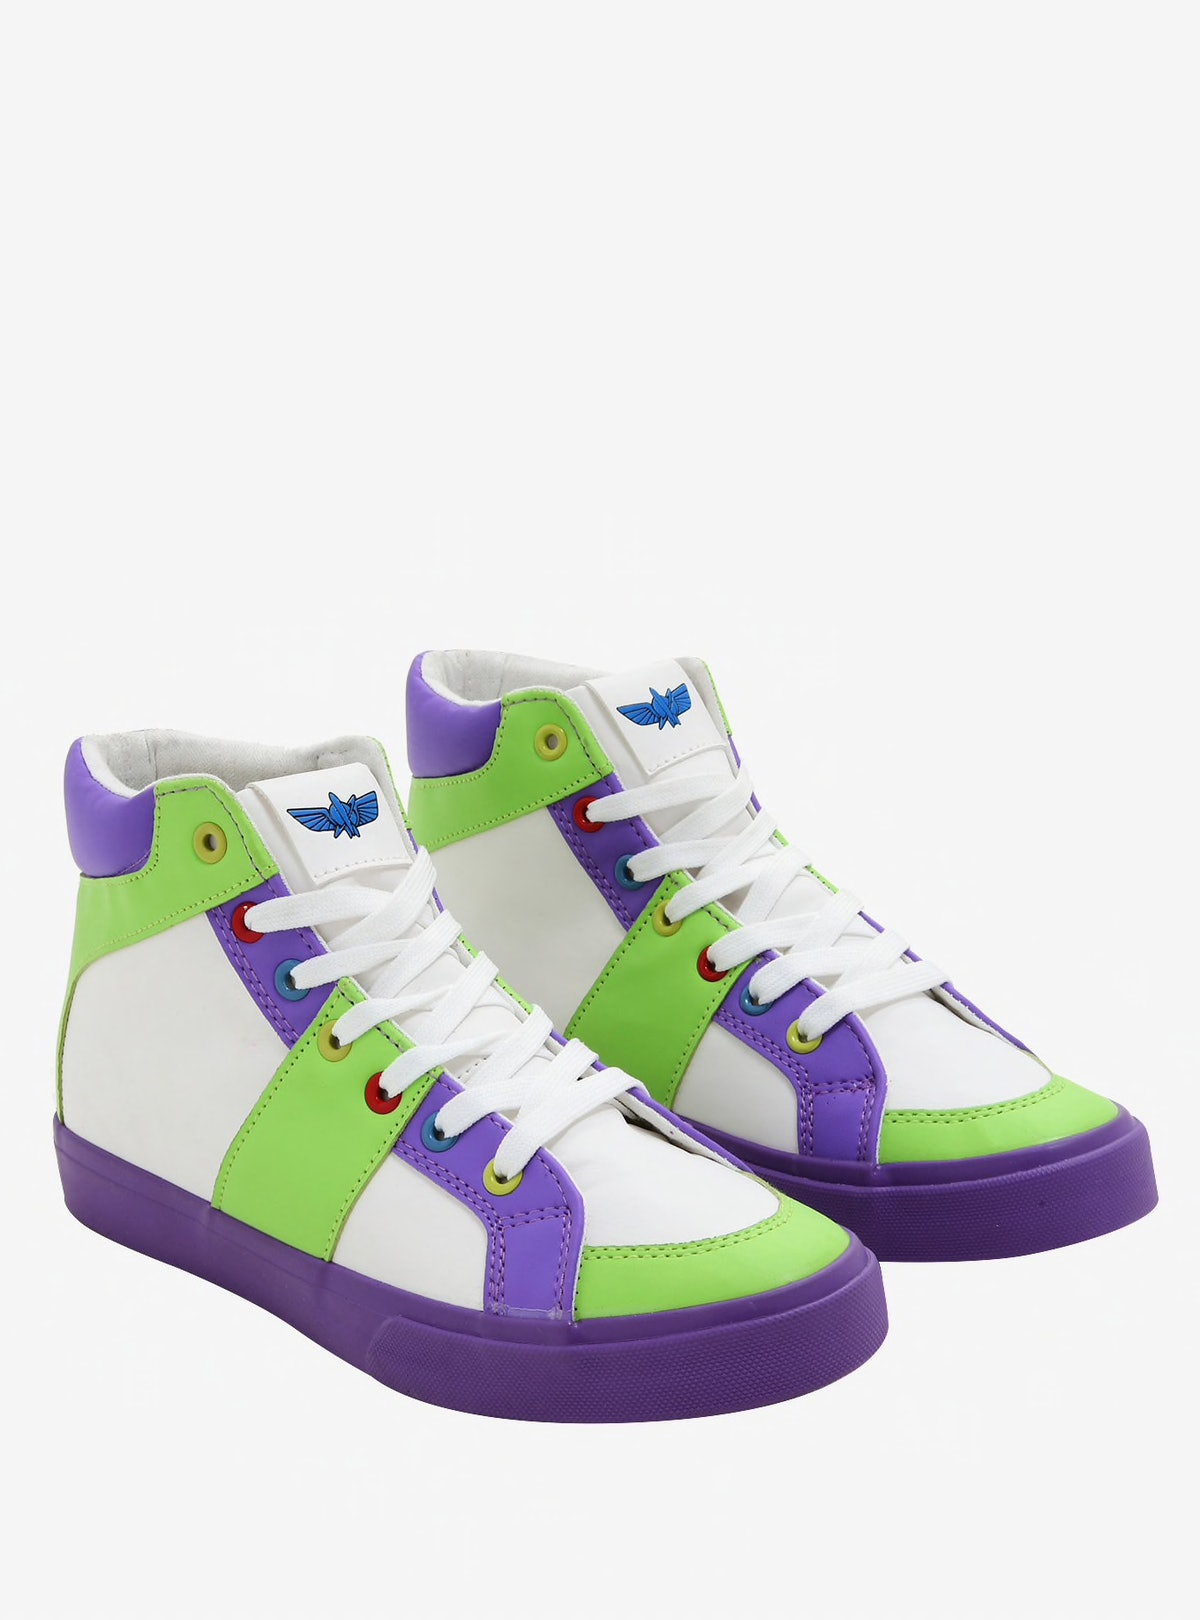 Buzz Lightyear Cosplay Sneakers